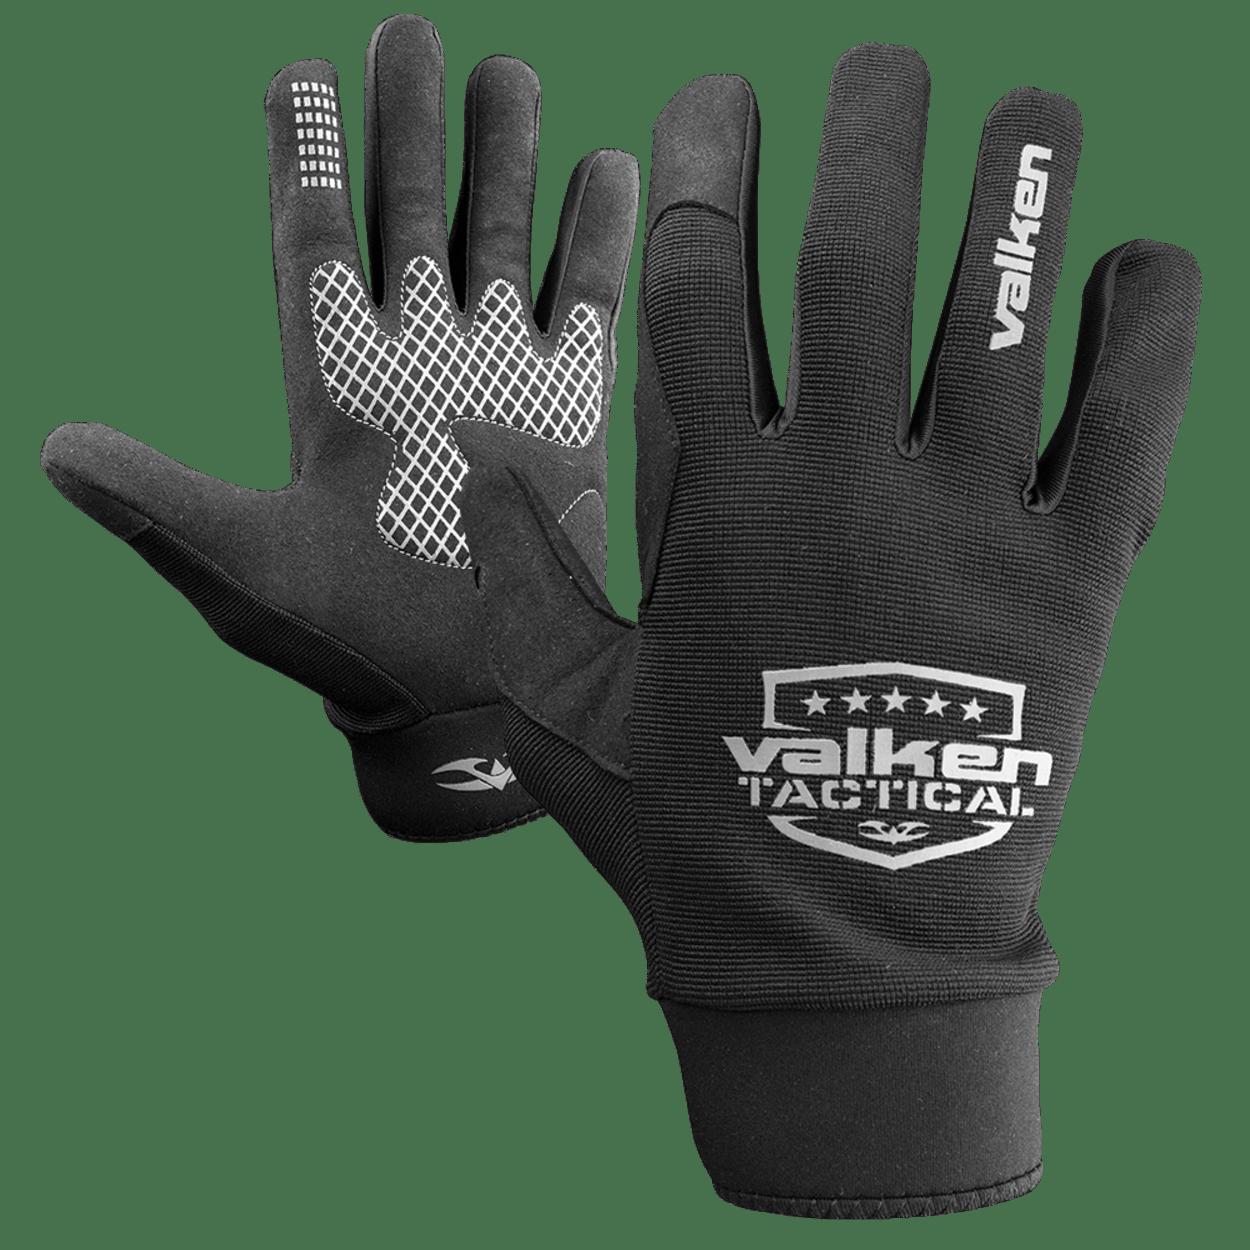 Valken Sierra 2 Gloves – Black product image